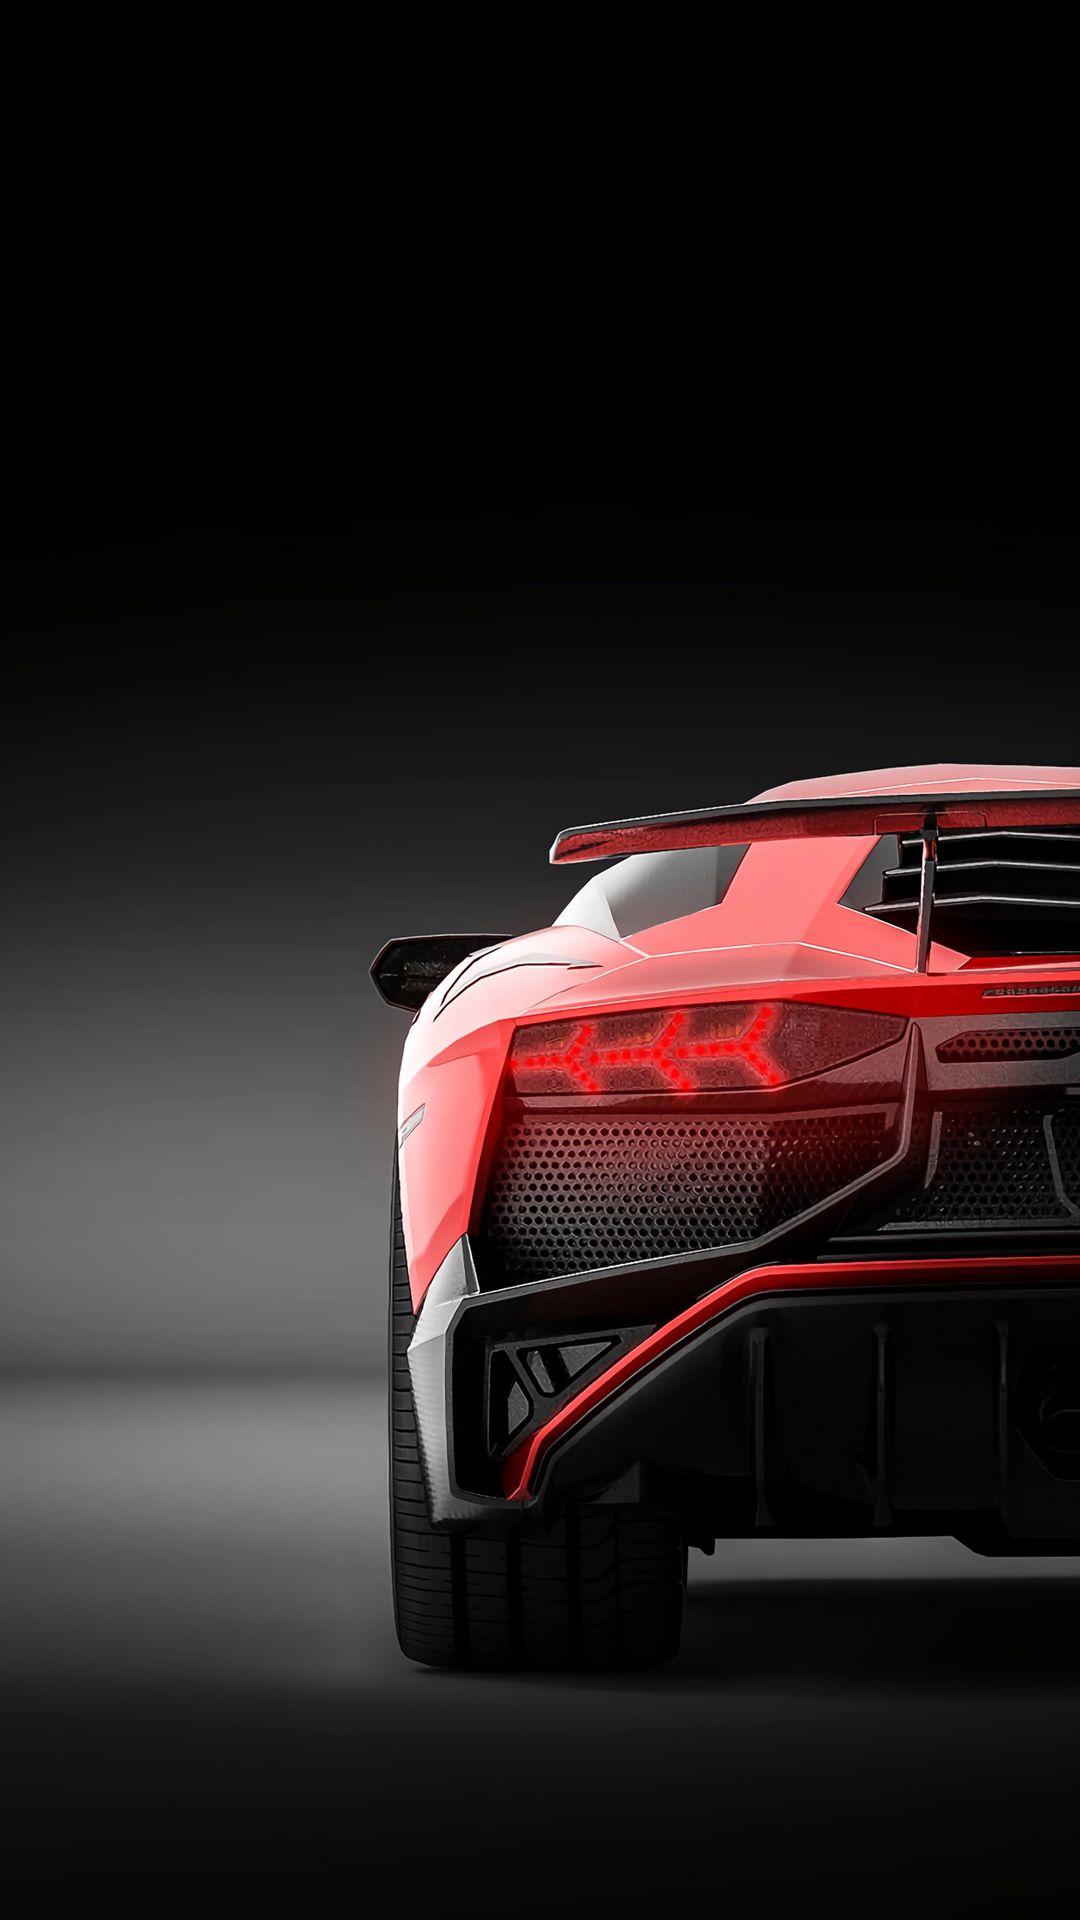 Lamborghini Super Sport HD Wallpapers Free Download